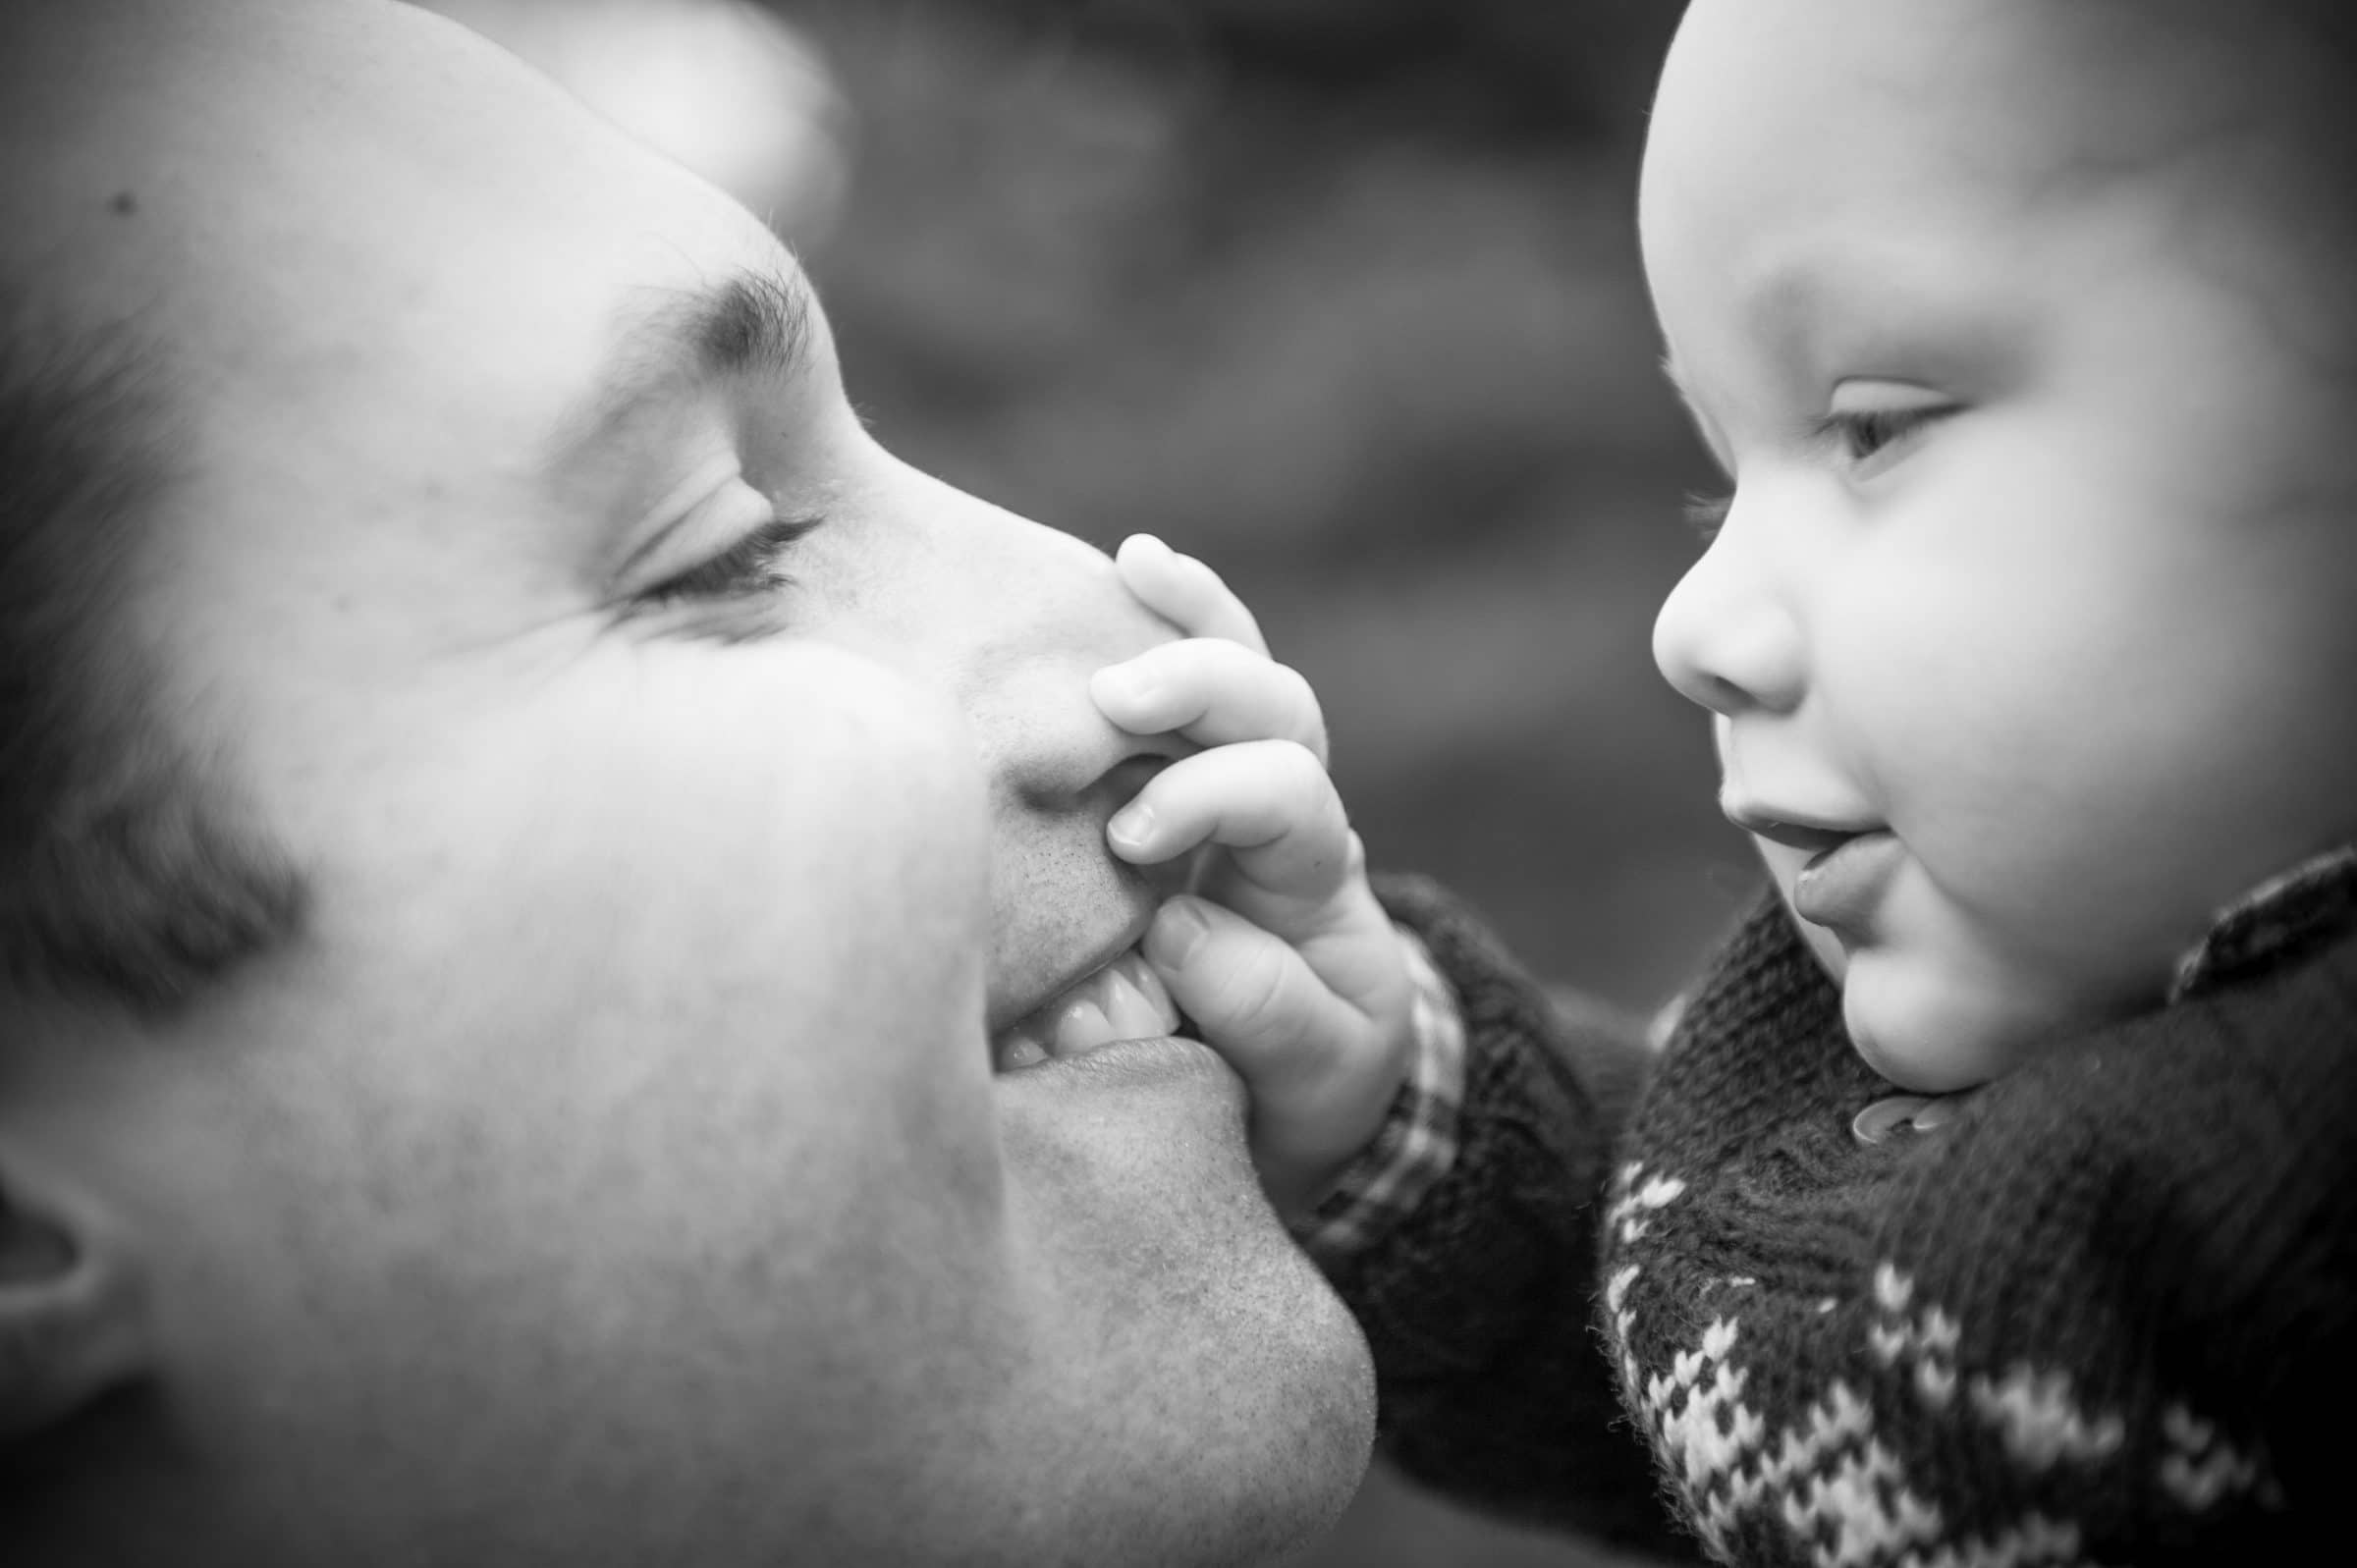 son grabbing dads nose